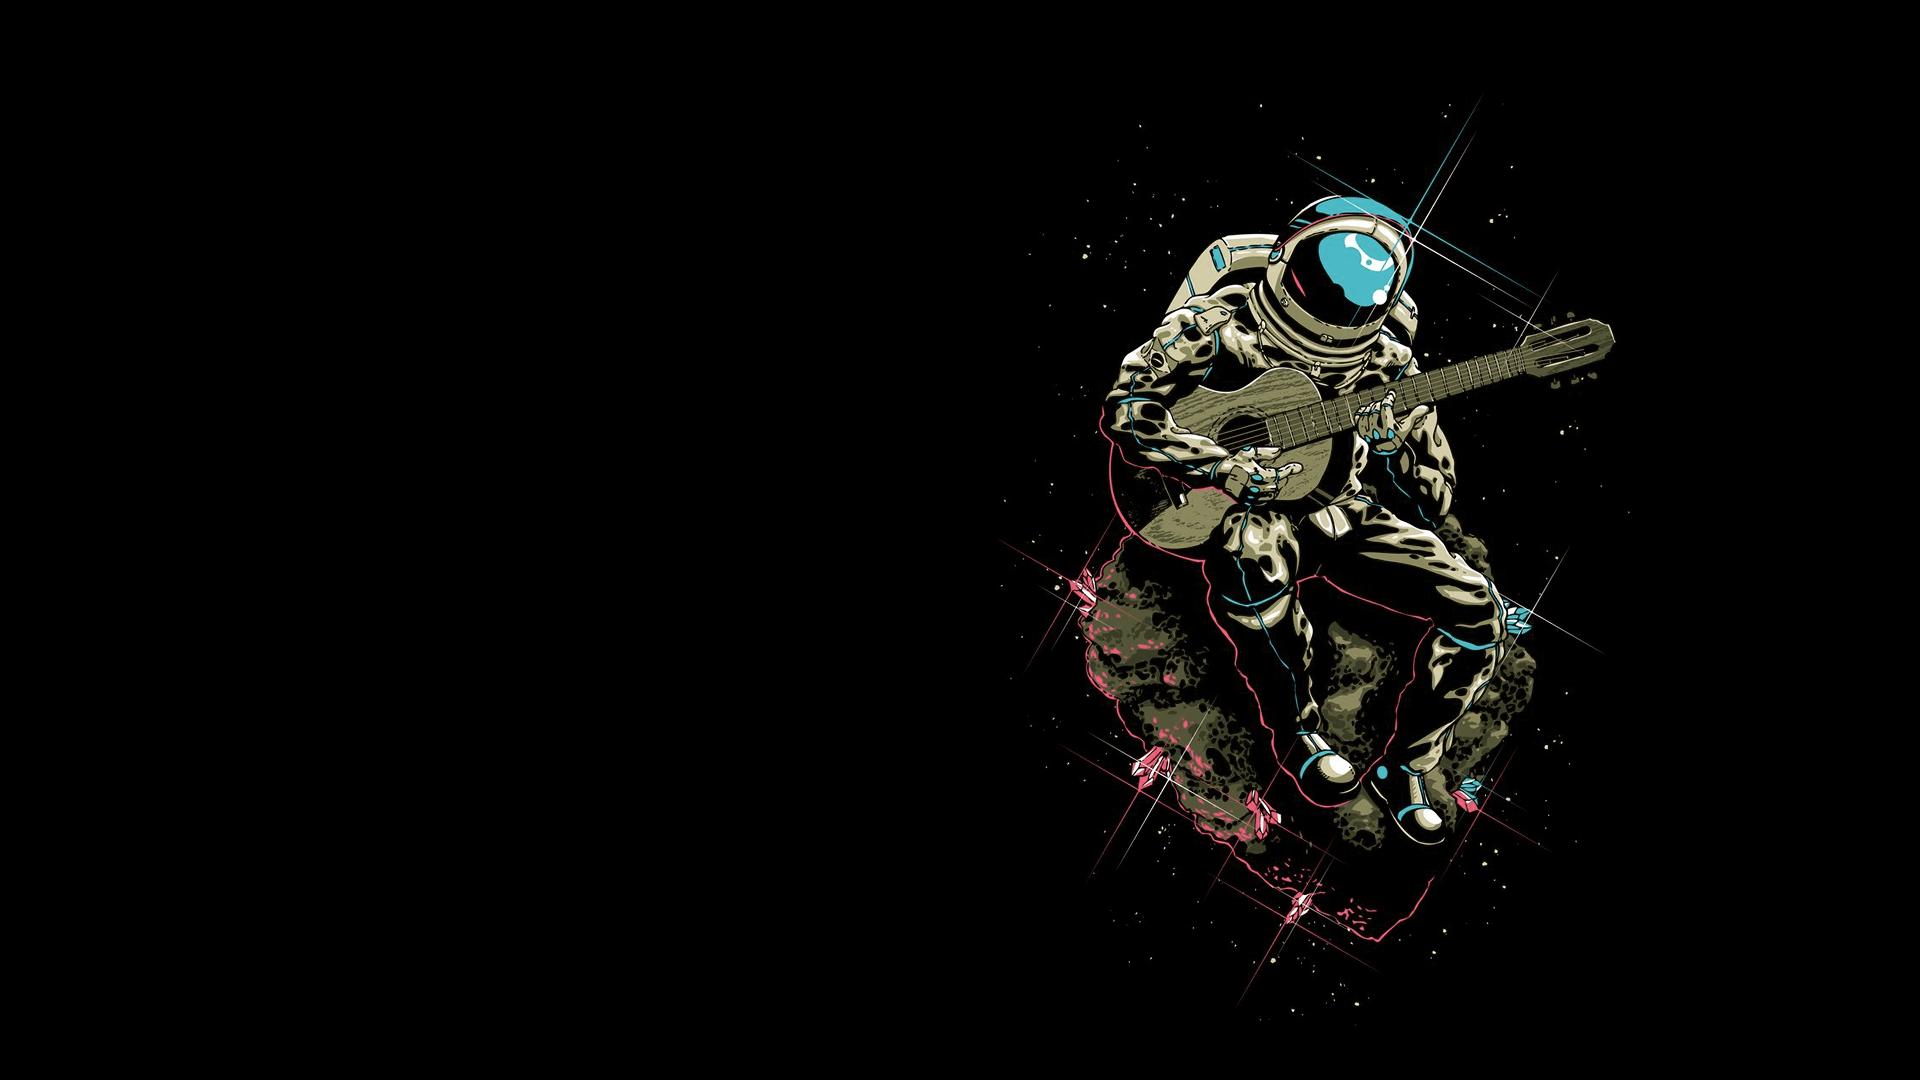 5800 Wallpaper Hp Astronaut Hd Terbaru